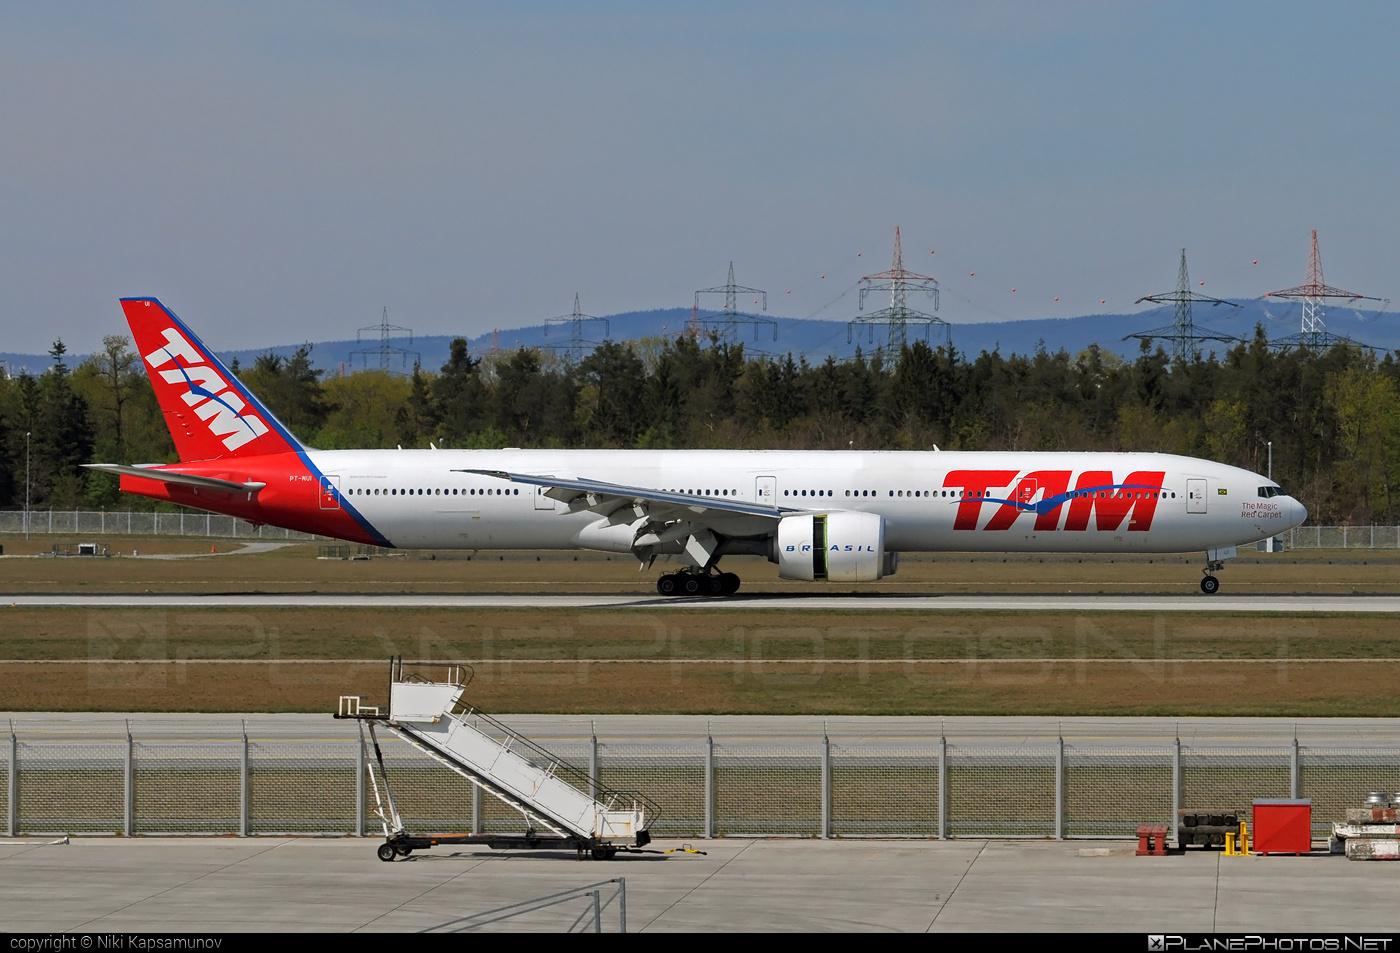 Boeing 777-300ER - PT-MUI operated by TAM Linhas Aéreas #b777 #b777er #boeing #boeing777 #tam #tamairlines #tamlinhasaereas #tripleseven